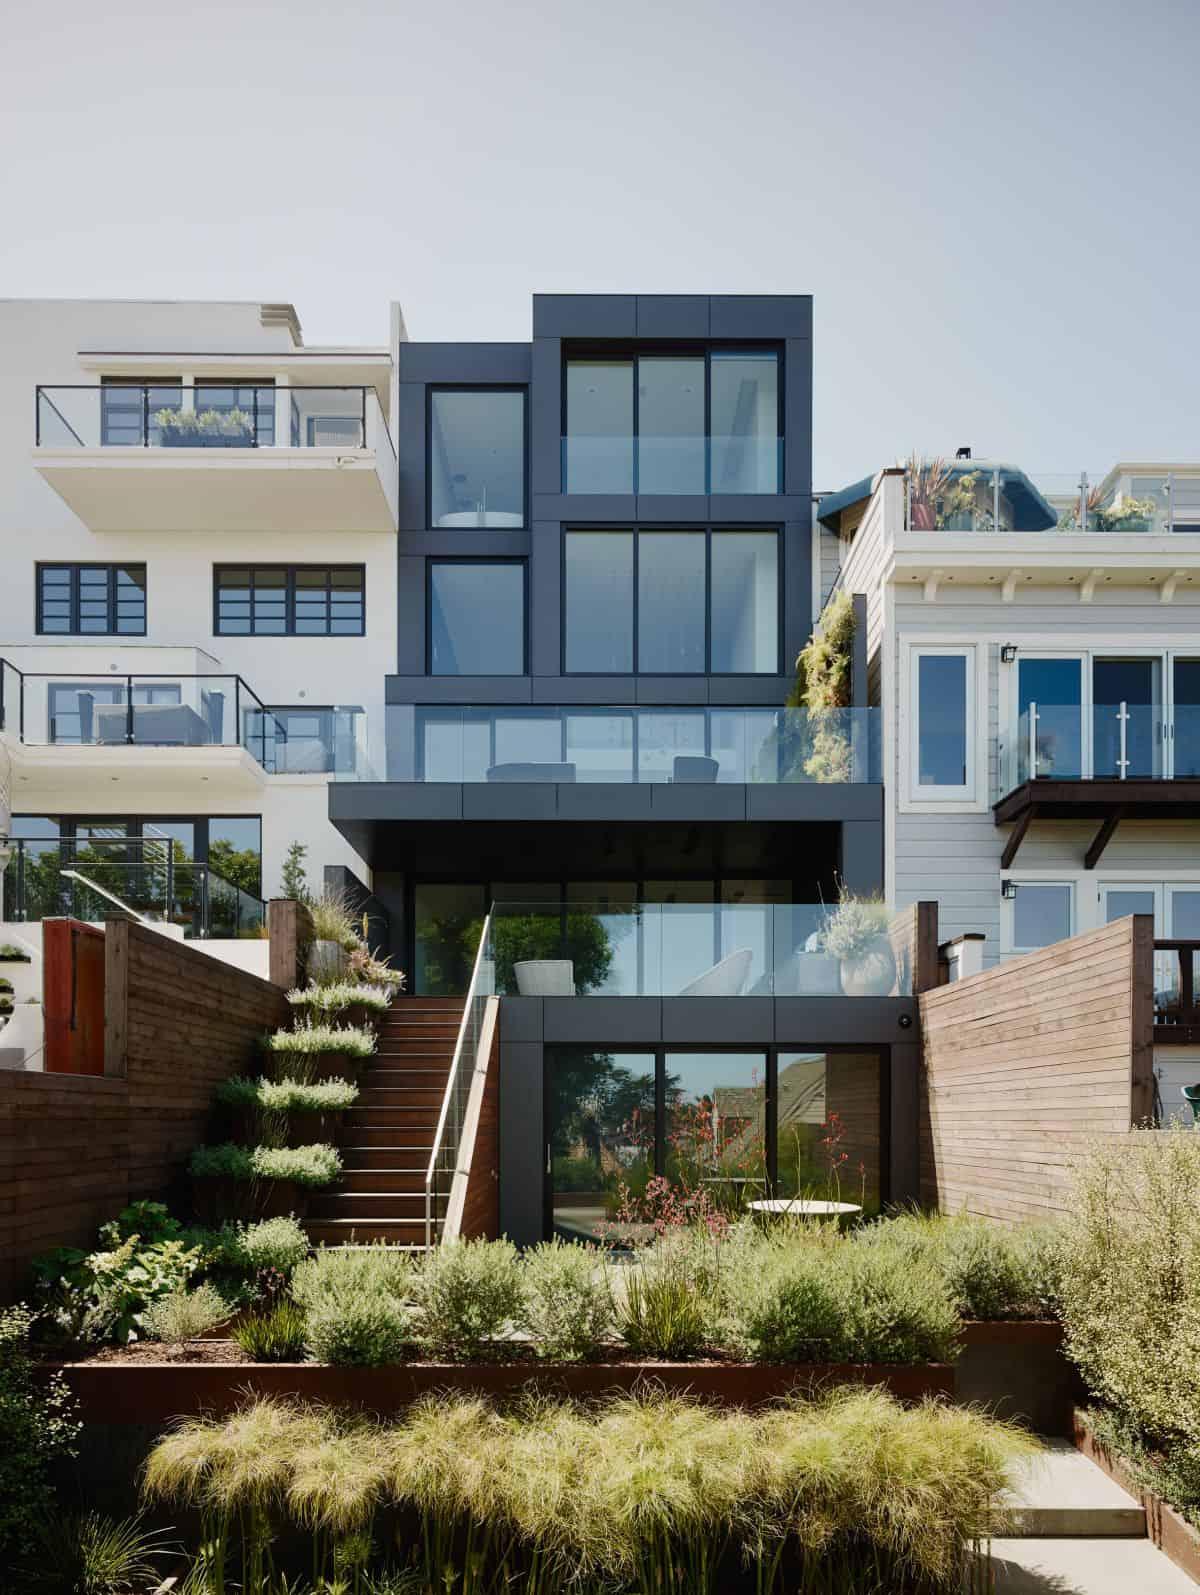 1572446304 210 10 amazing backyard landscape ideas for modern homes - 10 Amazing Backyard Landscape Ideas for Modern Homes